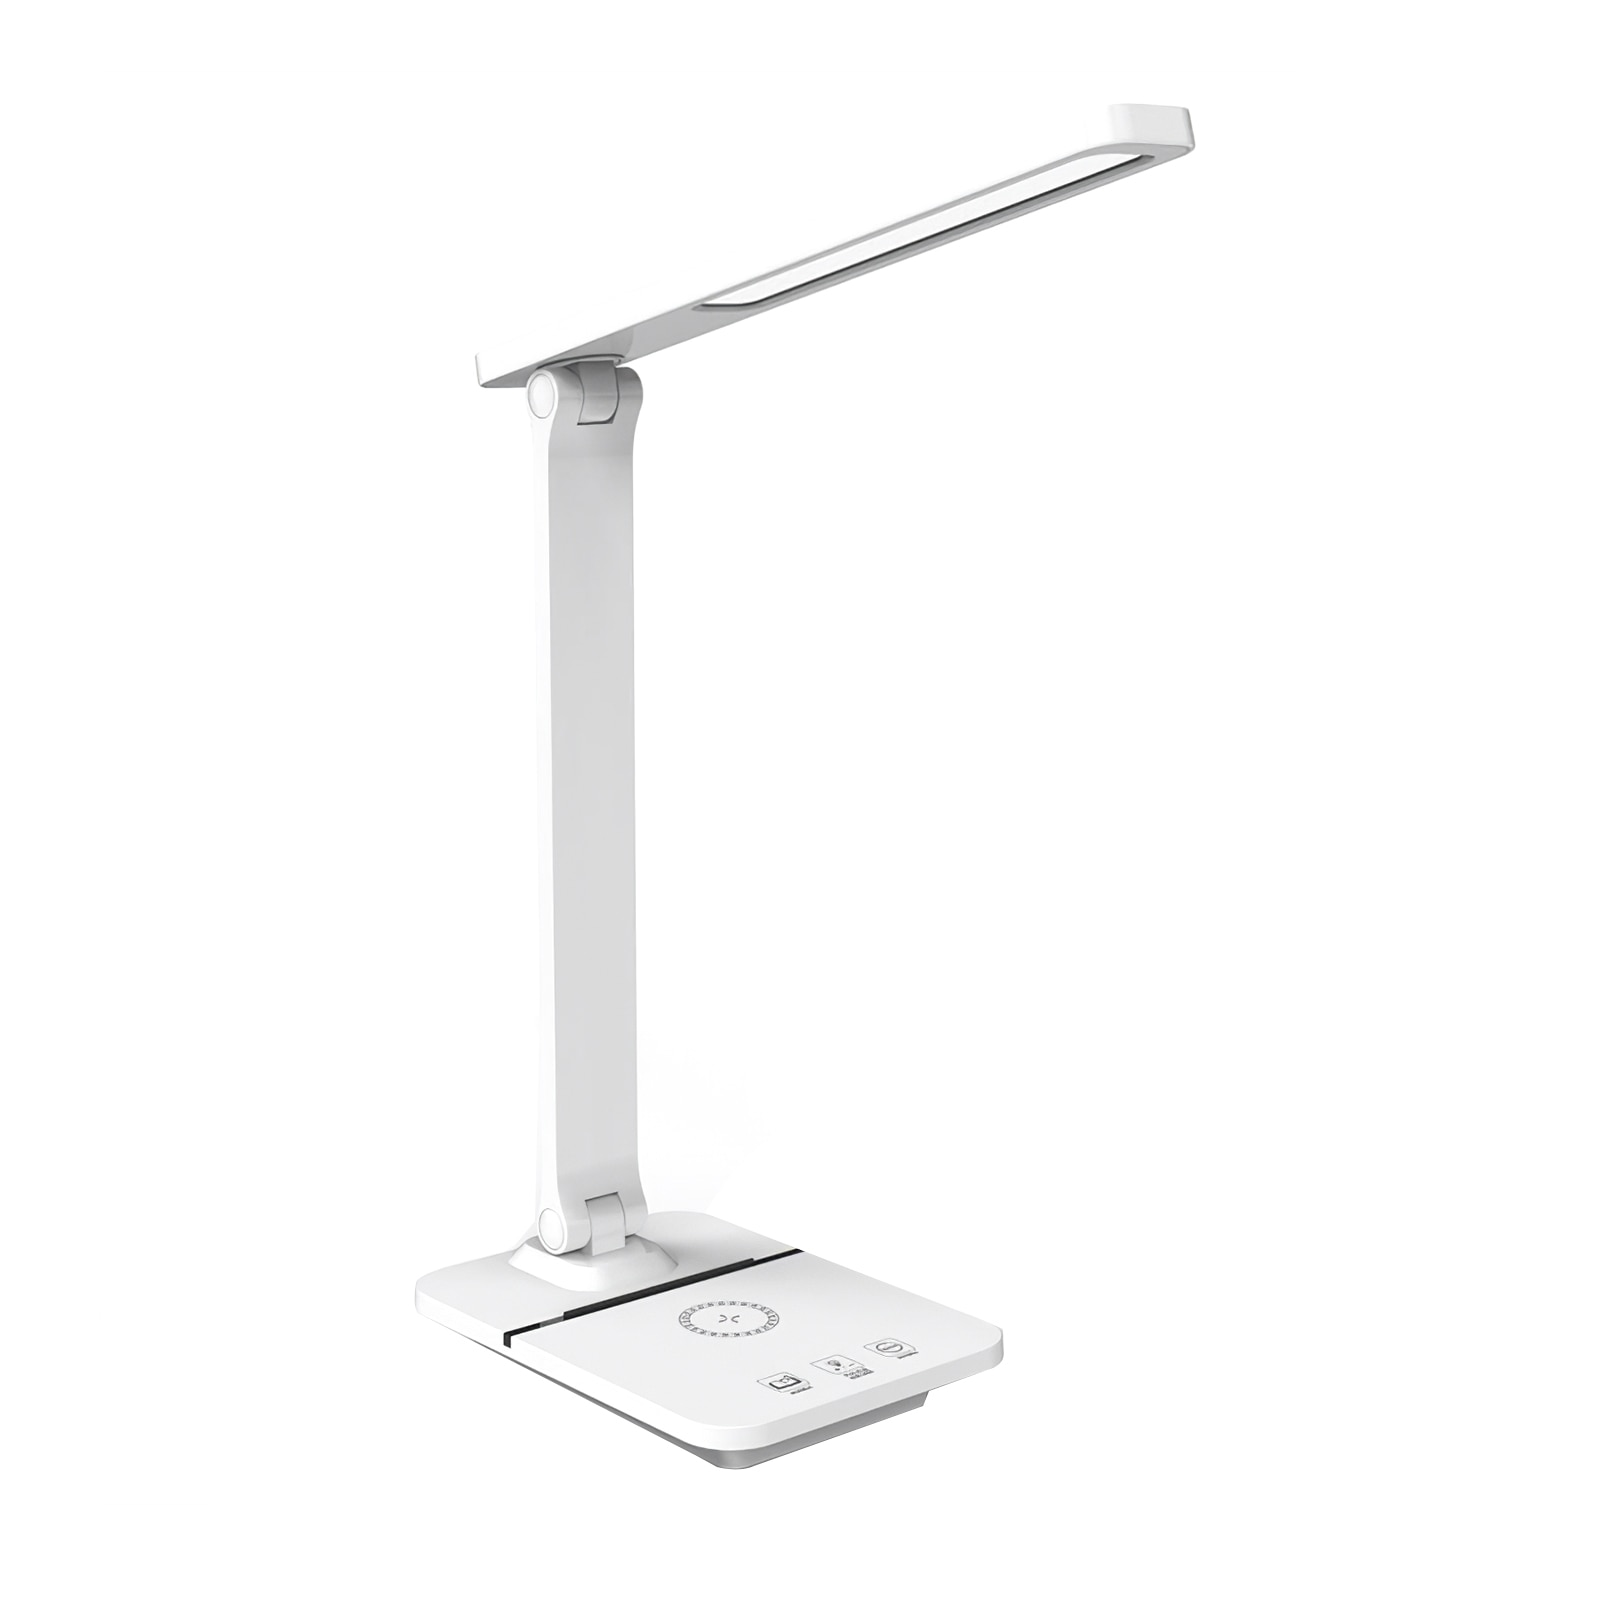 LED لمبة مكتب للطي مكتب ضوء لاسلكي شحن مصباح مصباح منضدة قابل للشحن ضوء الليل مع منفذ شحن USB